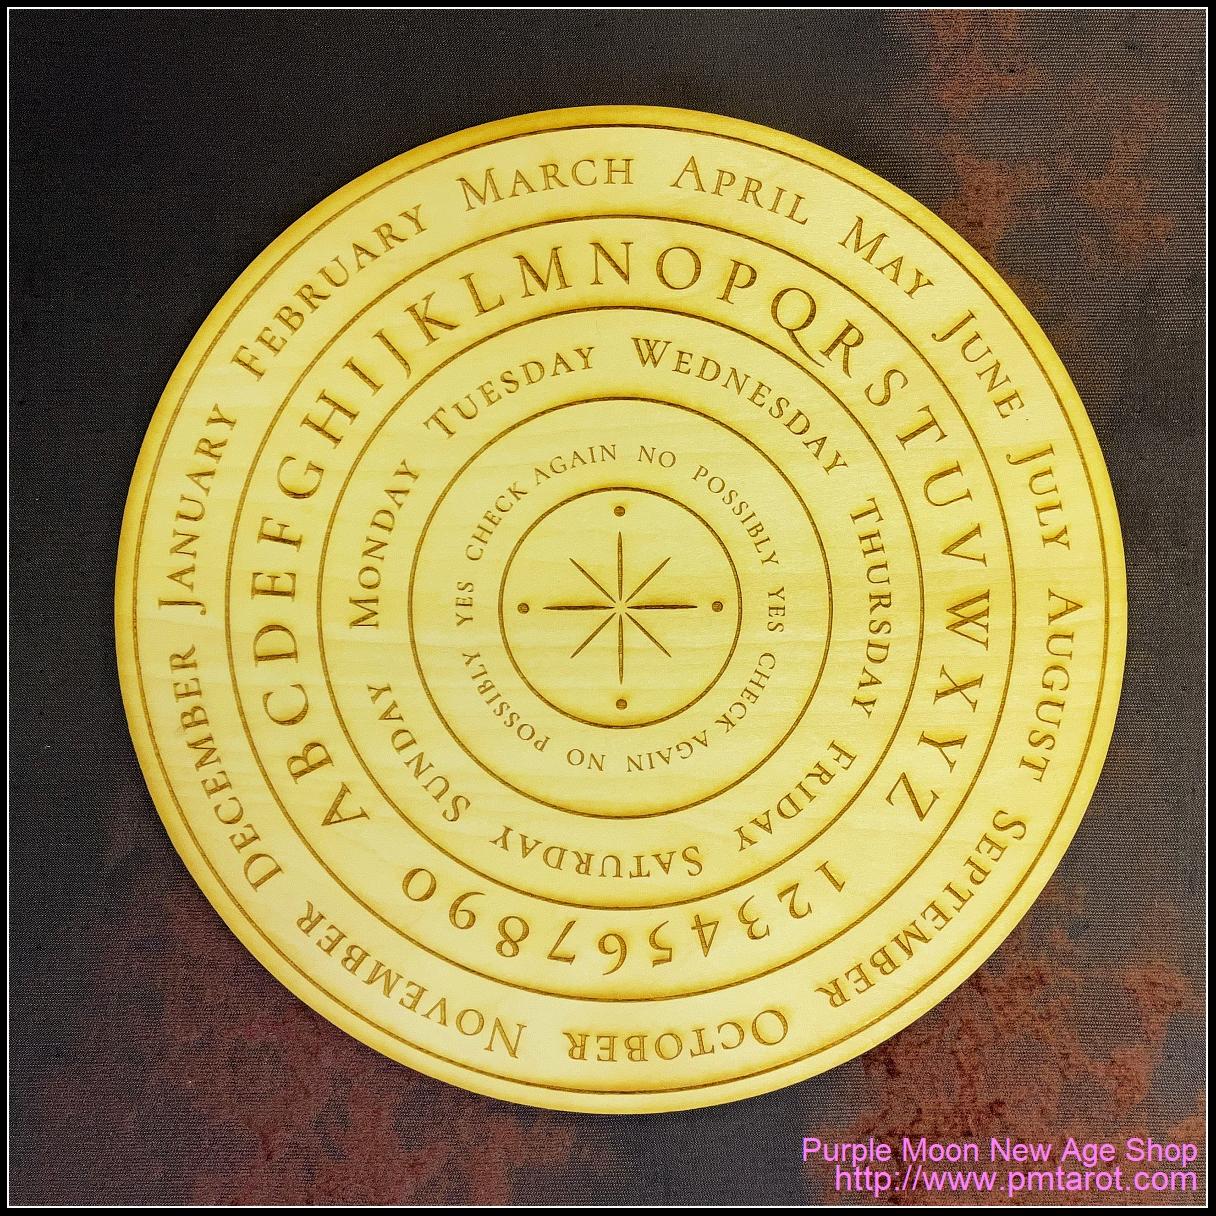 The Pendulum Chart